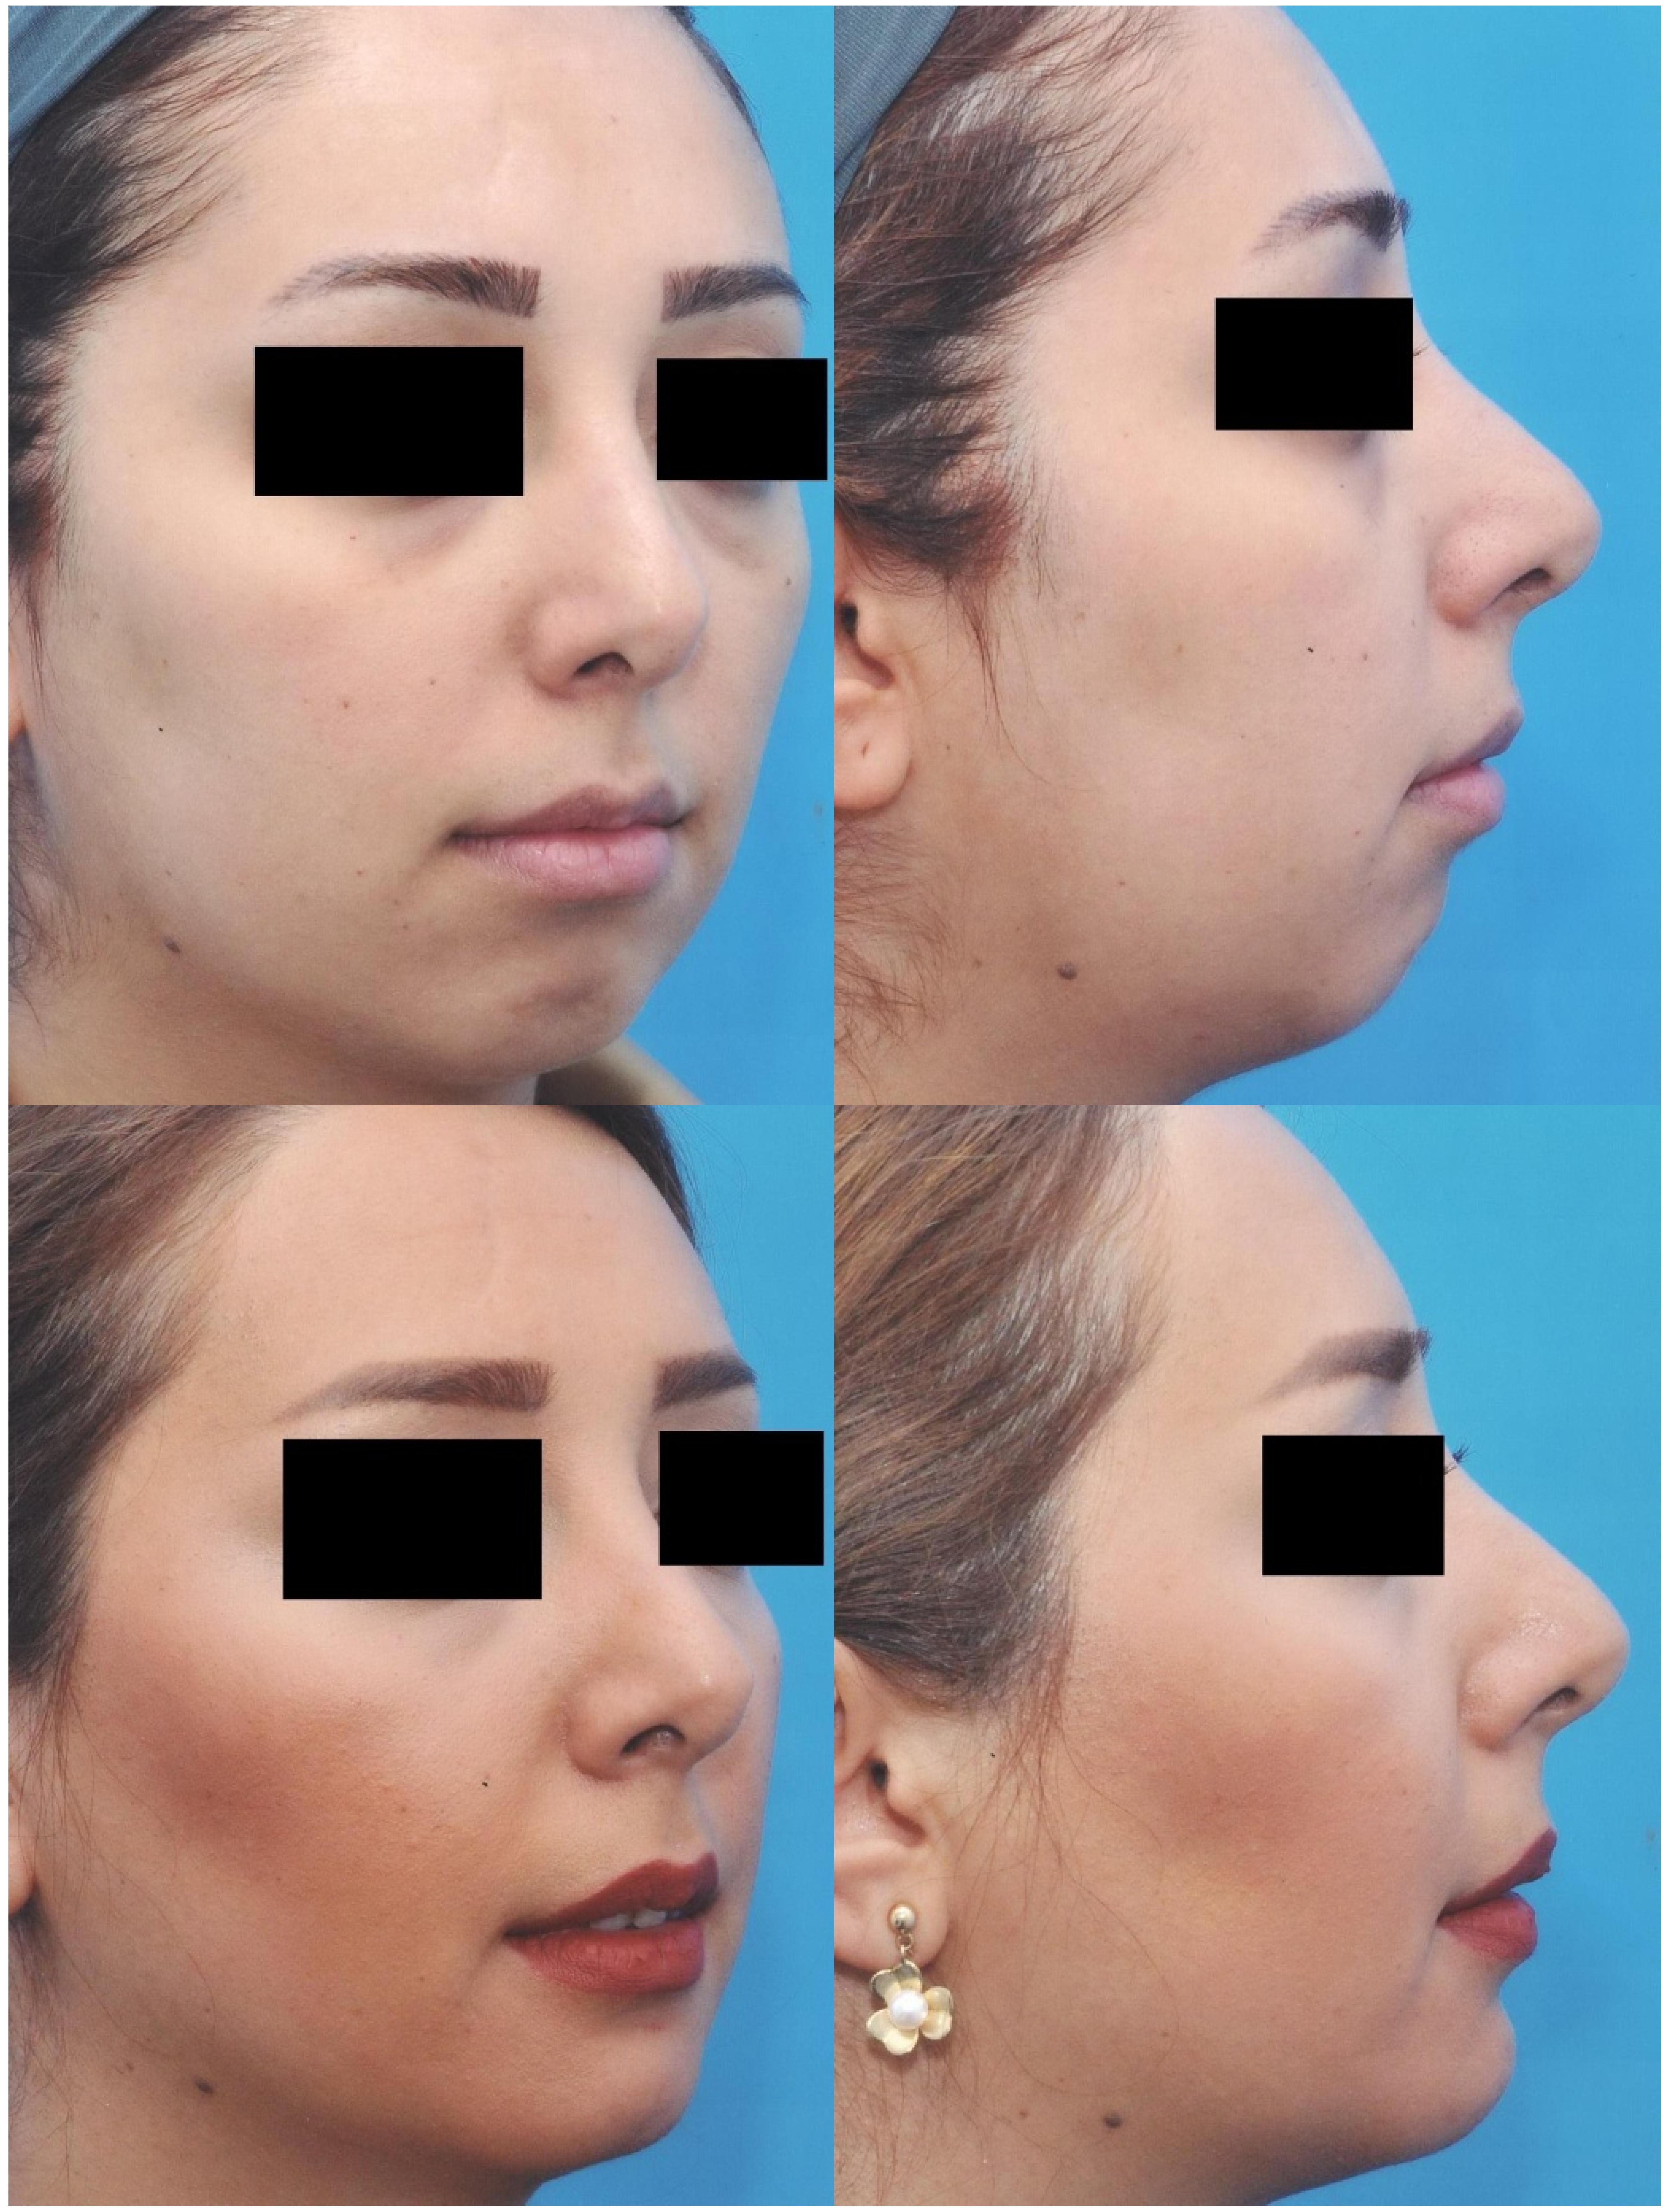 Facial Augmentation with Implants   IntechOpen